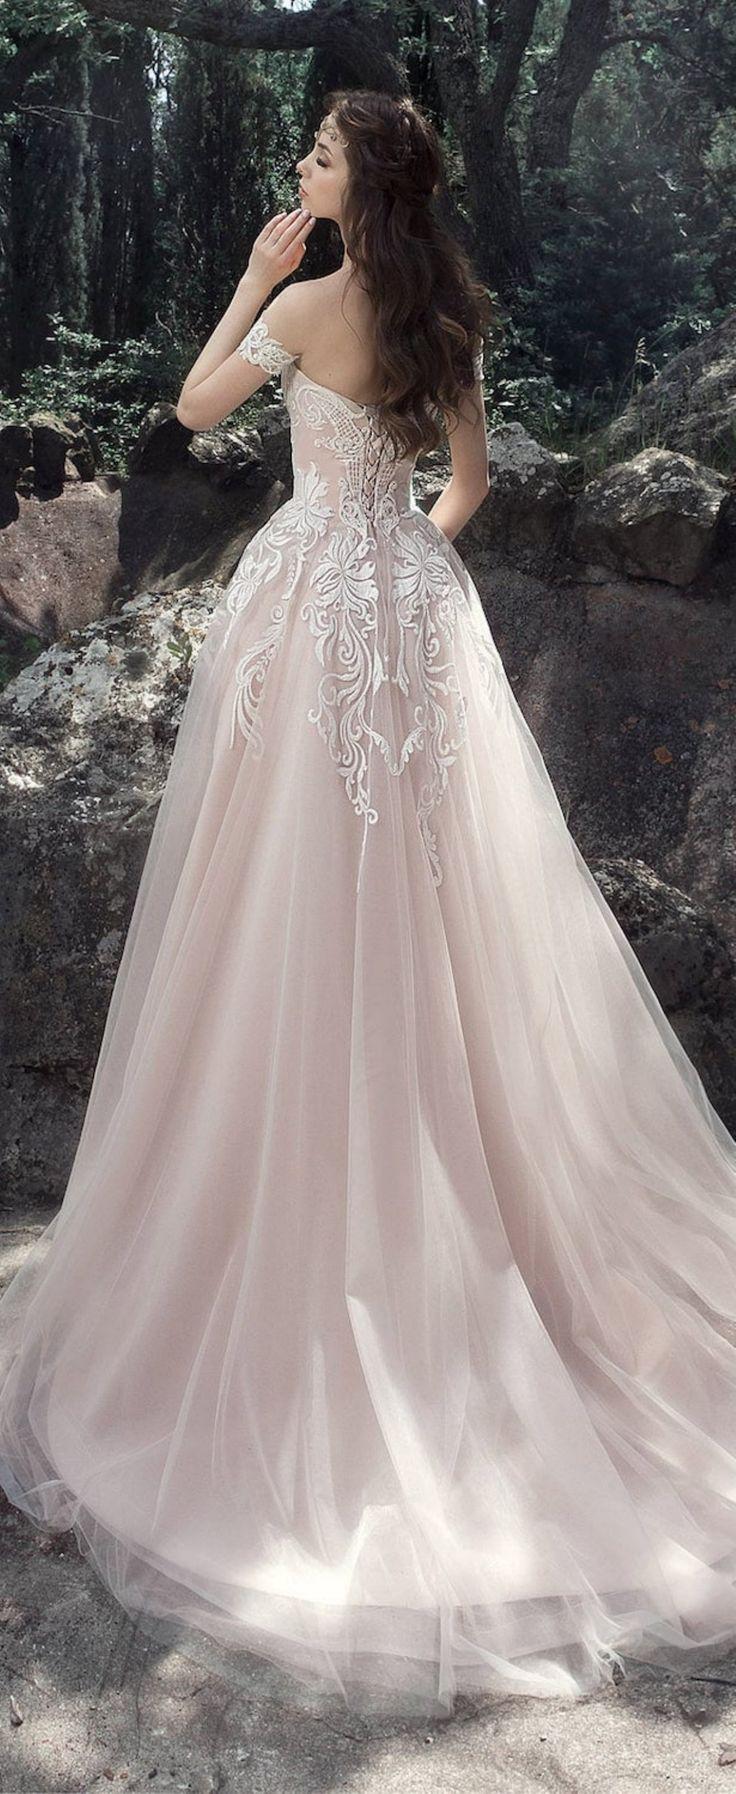 nice 55 Breathtaking Disney Princess Wedding Dress to Fullfill your Wedding Fantasy  https://viscawedding.com/2017/03/28/breathtaking-disney-princess-wedding-dress-fullfill-wedding-fantasy/